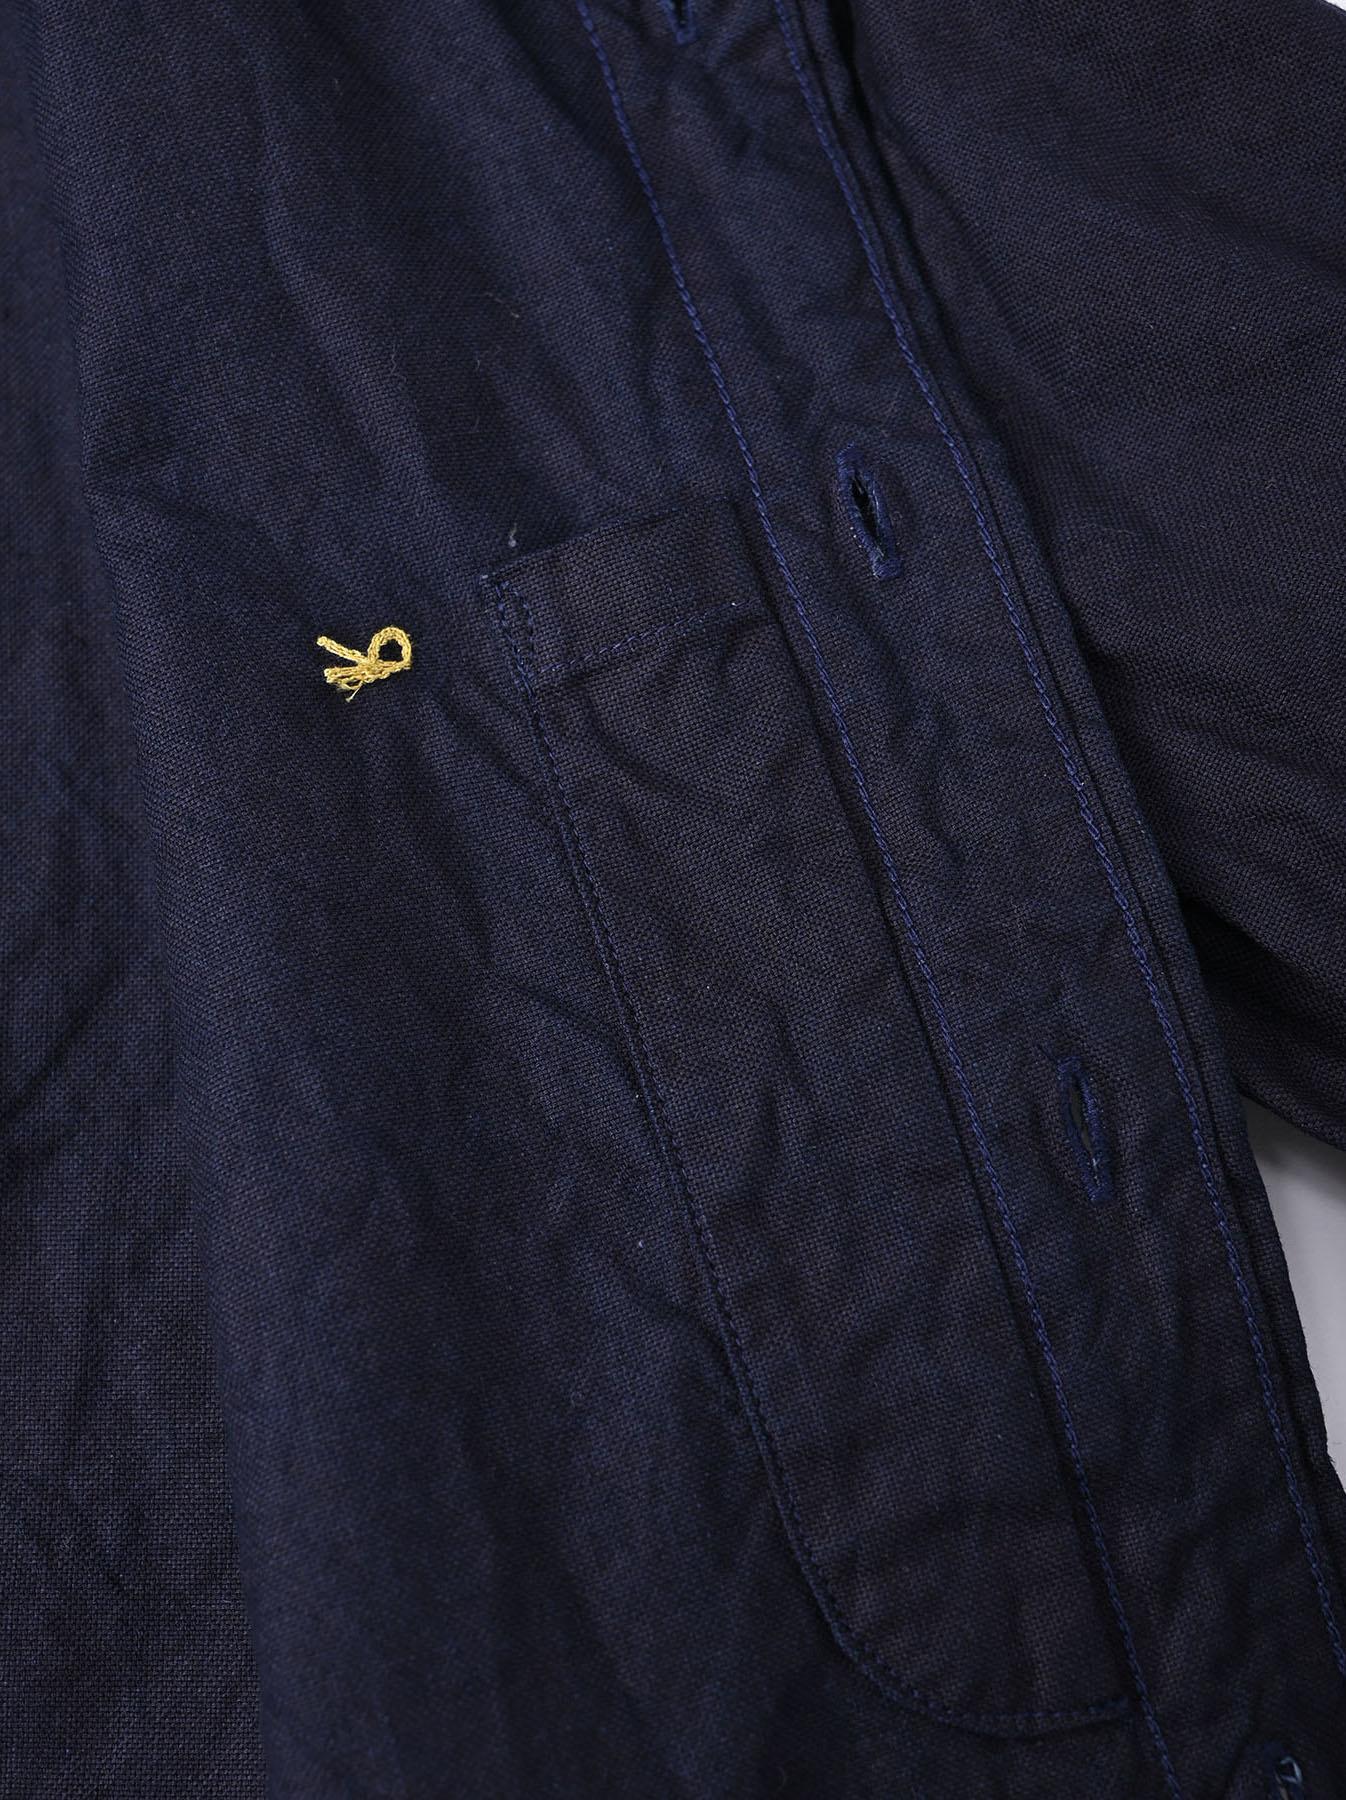 Indigo  Zimbabwe Oxford 908 Regular Shirt-12